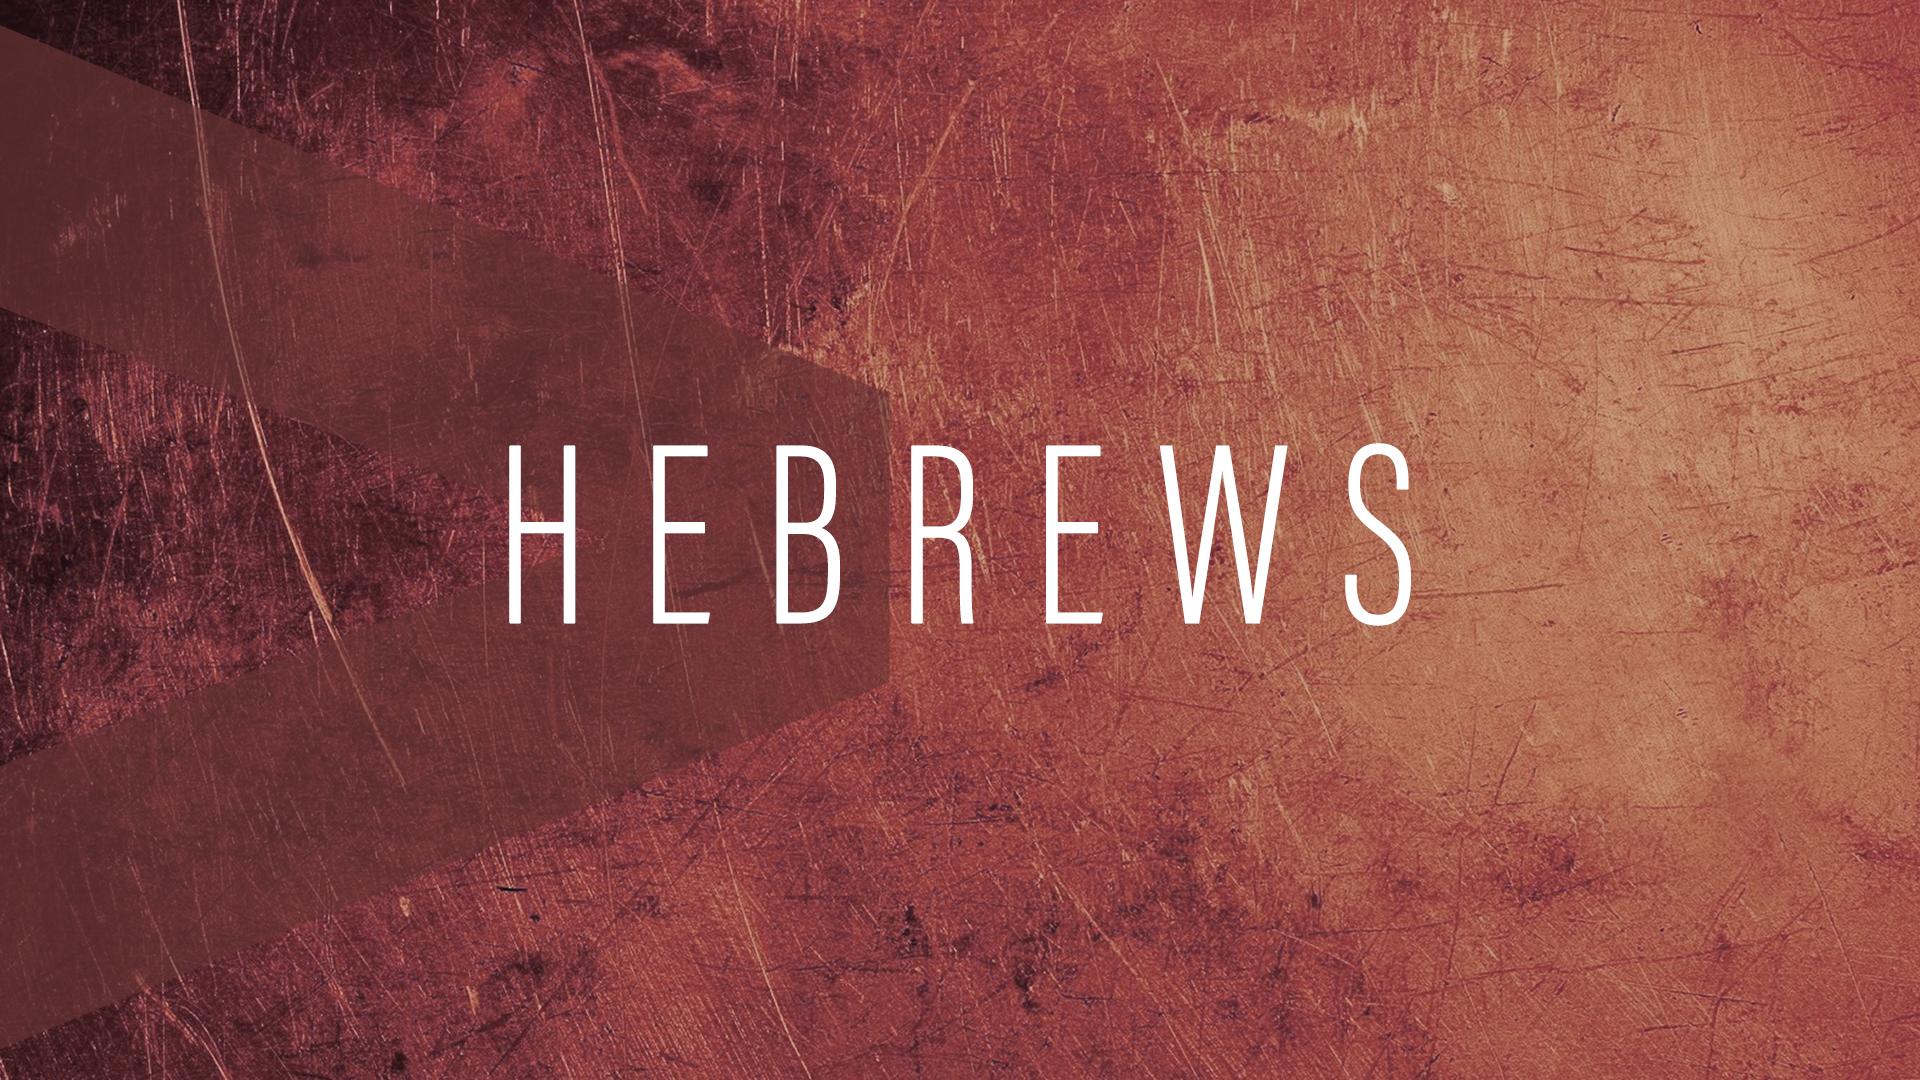 hebrews2019-1920-4.jpg